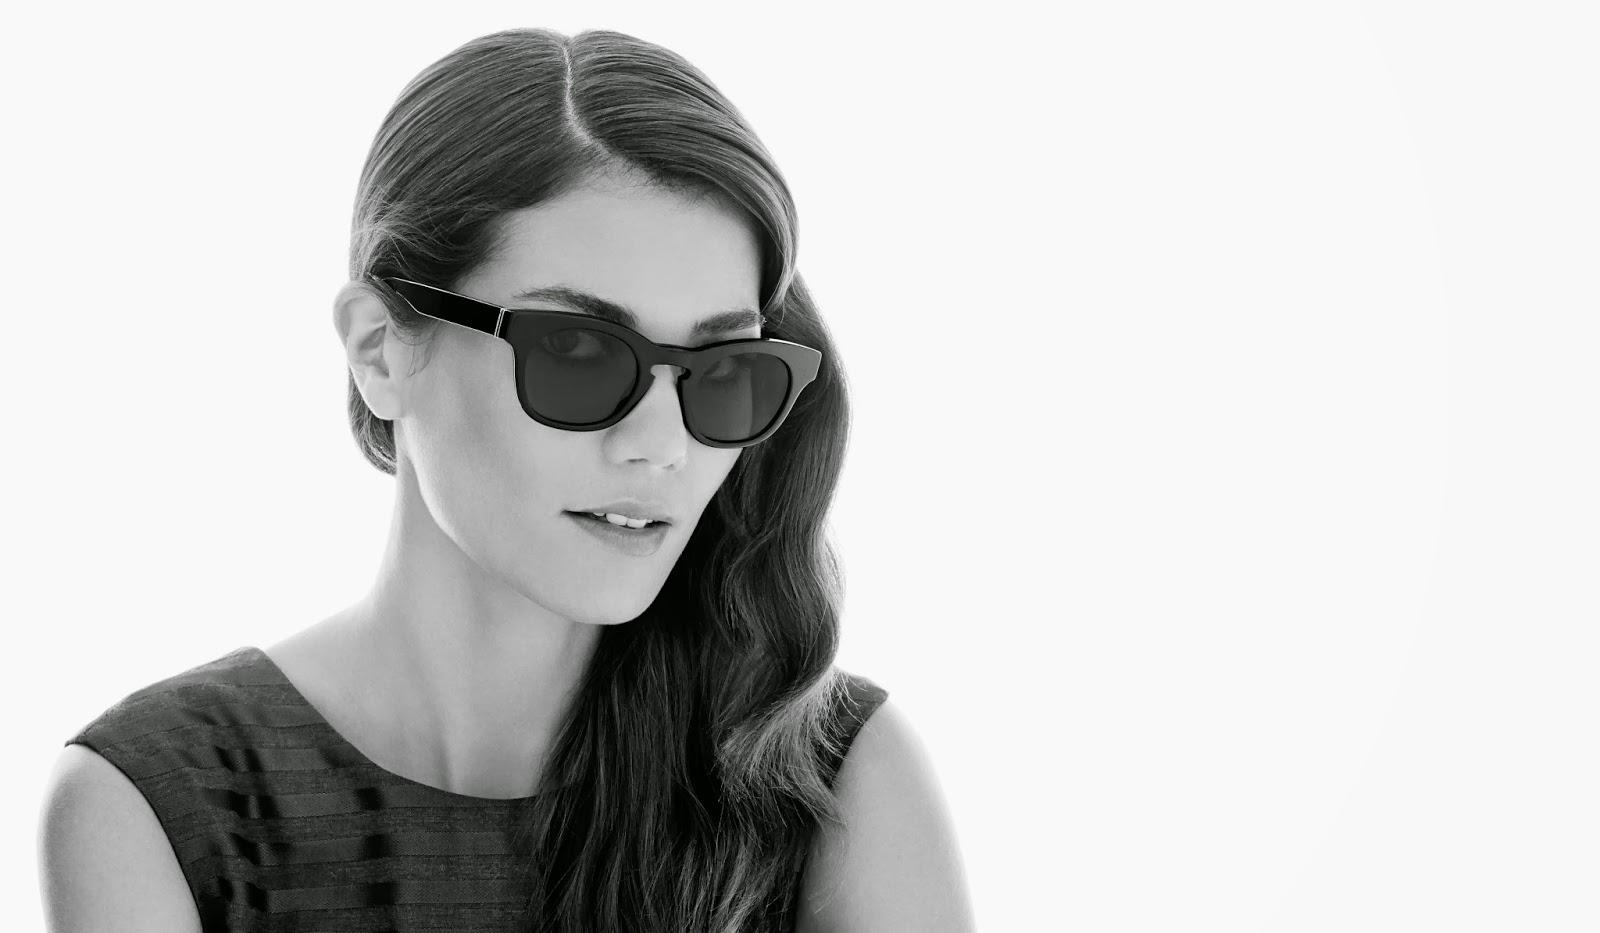 http://www.warbyparker.com/sunglasses/women/wheeler#revolver-black